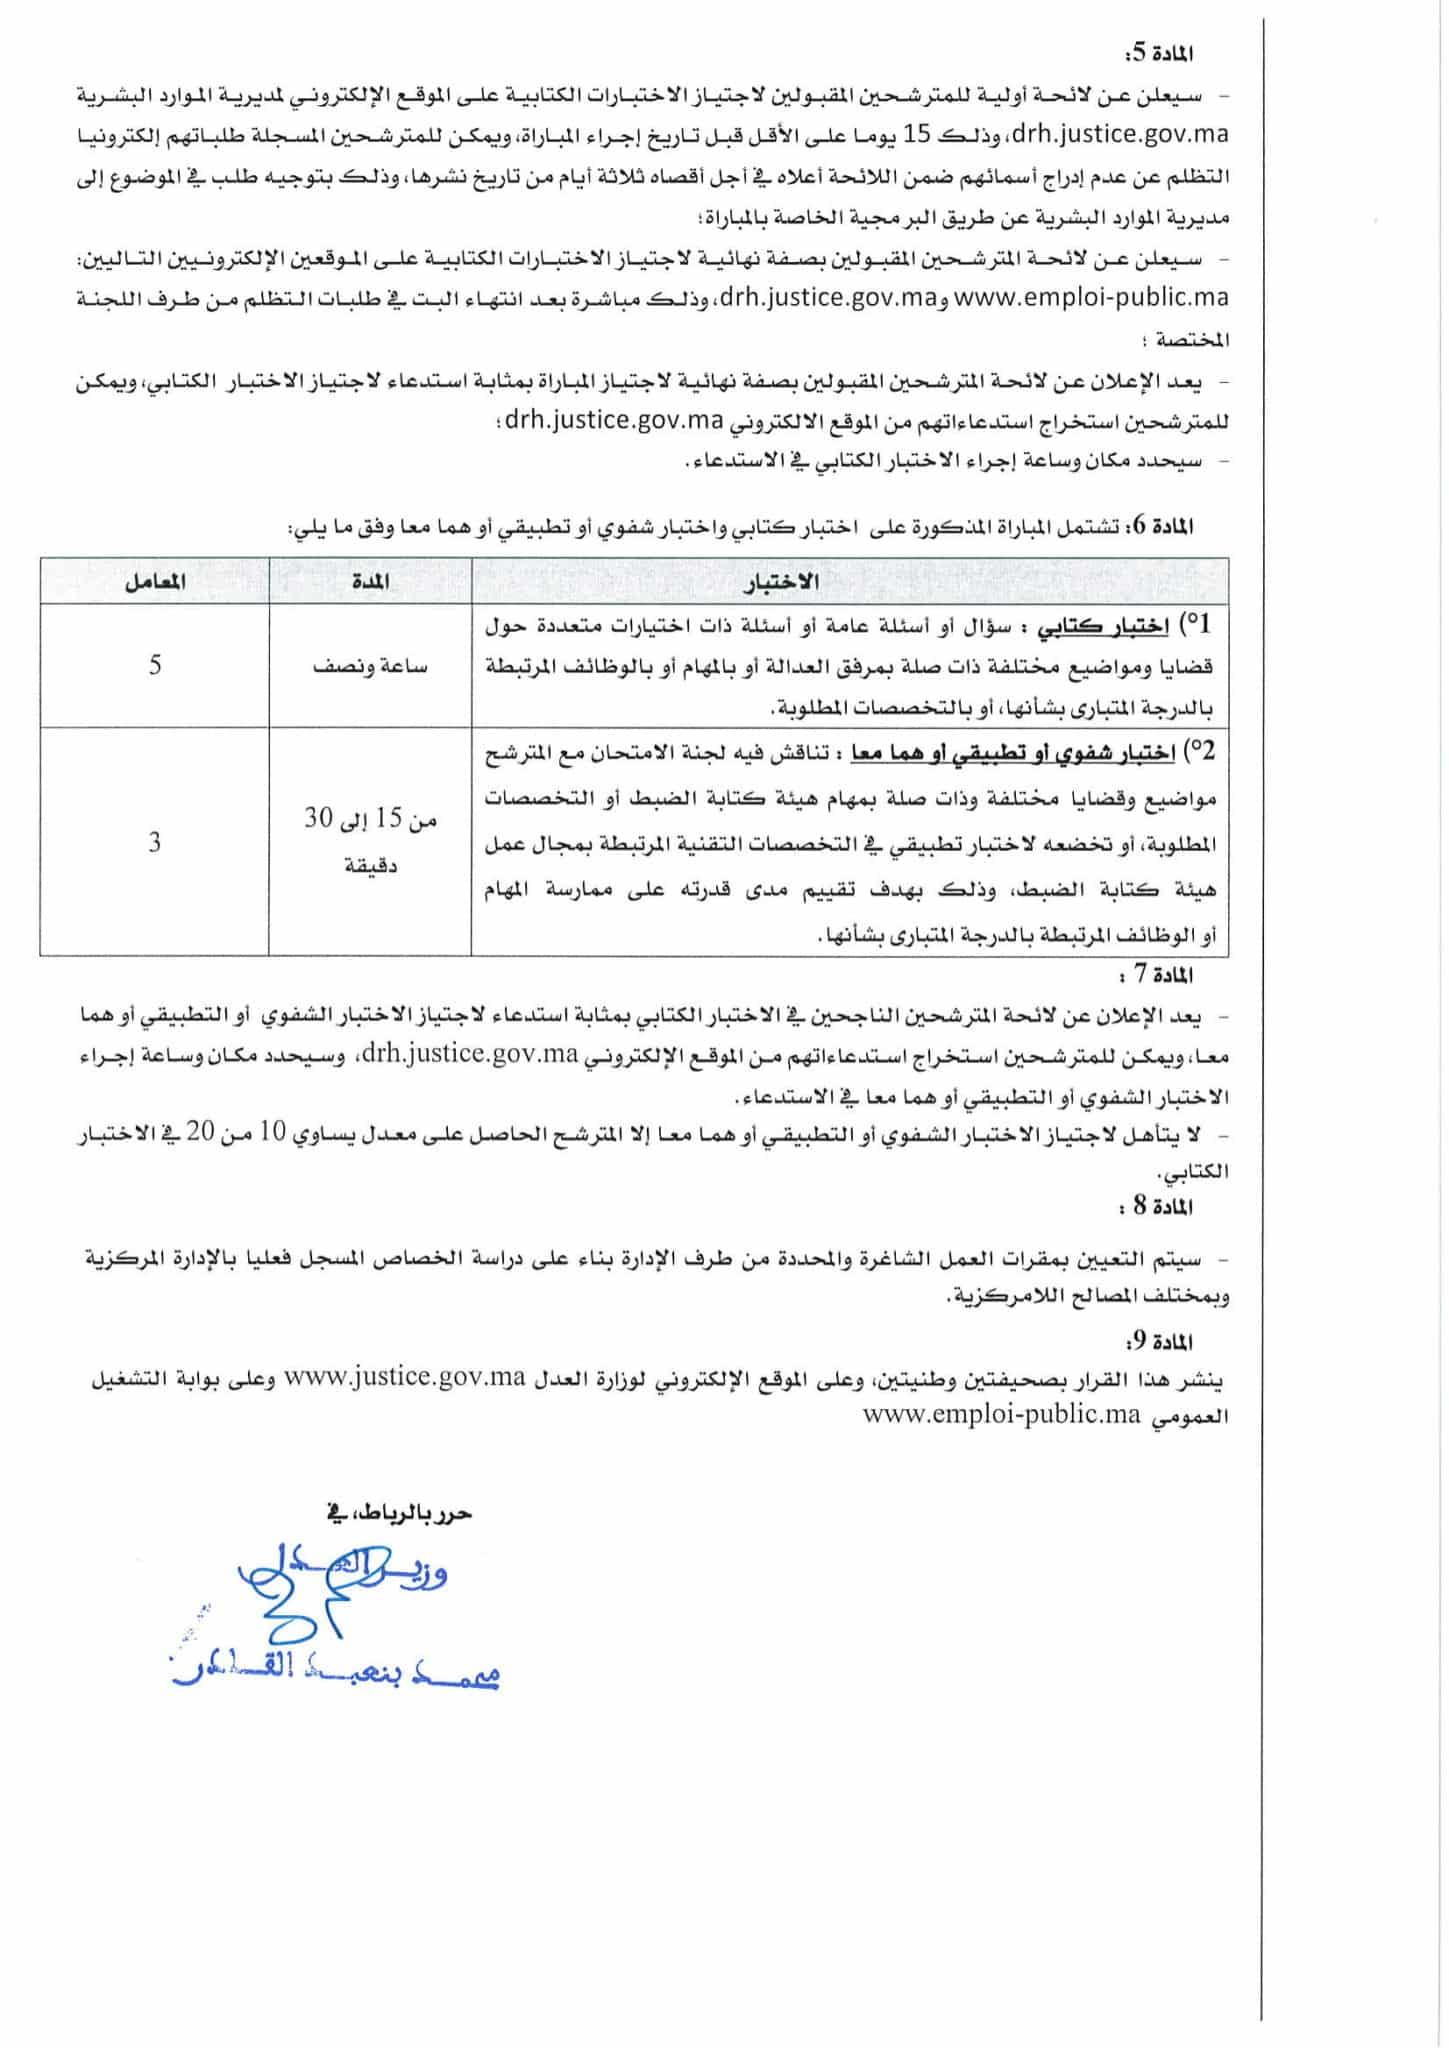 concours-ministere-de-la-justice-2020- maroc-alwadifa.com